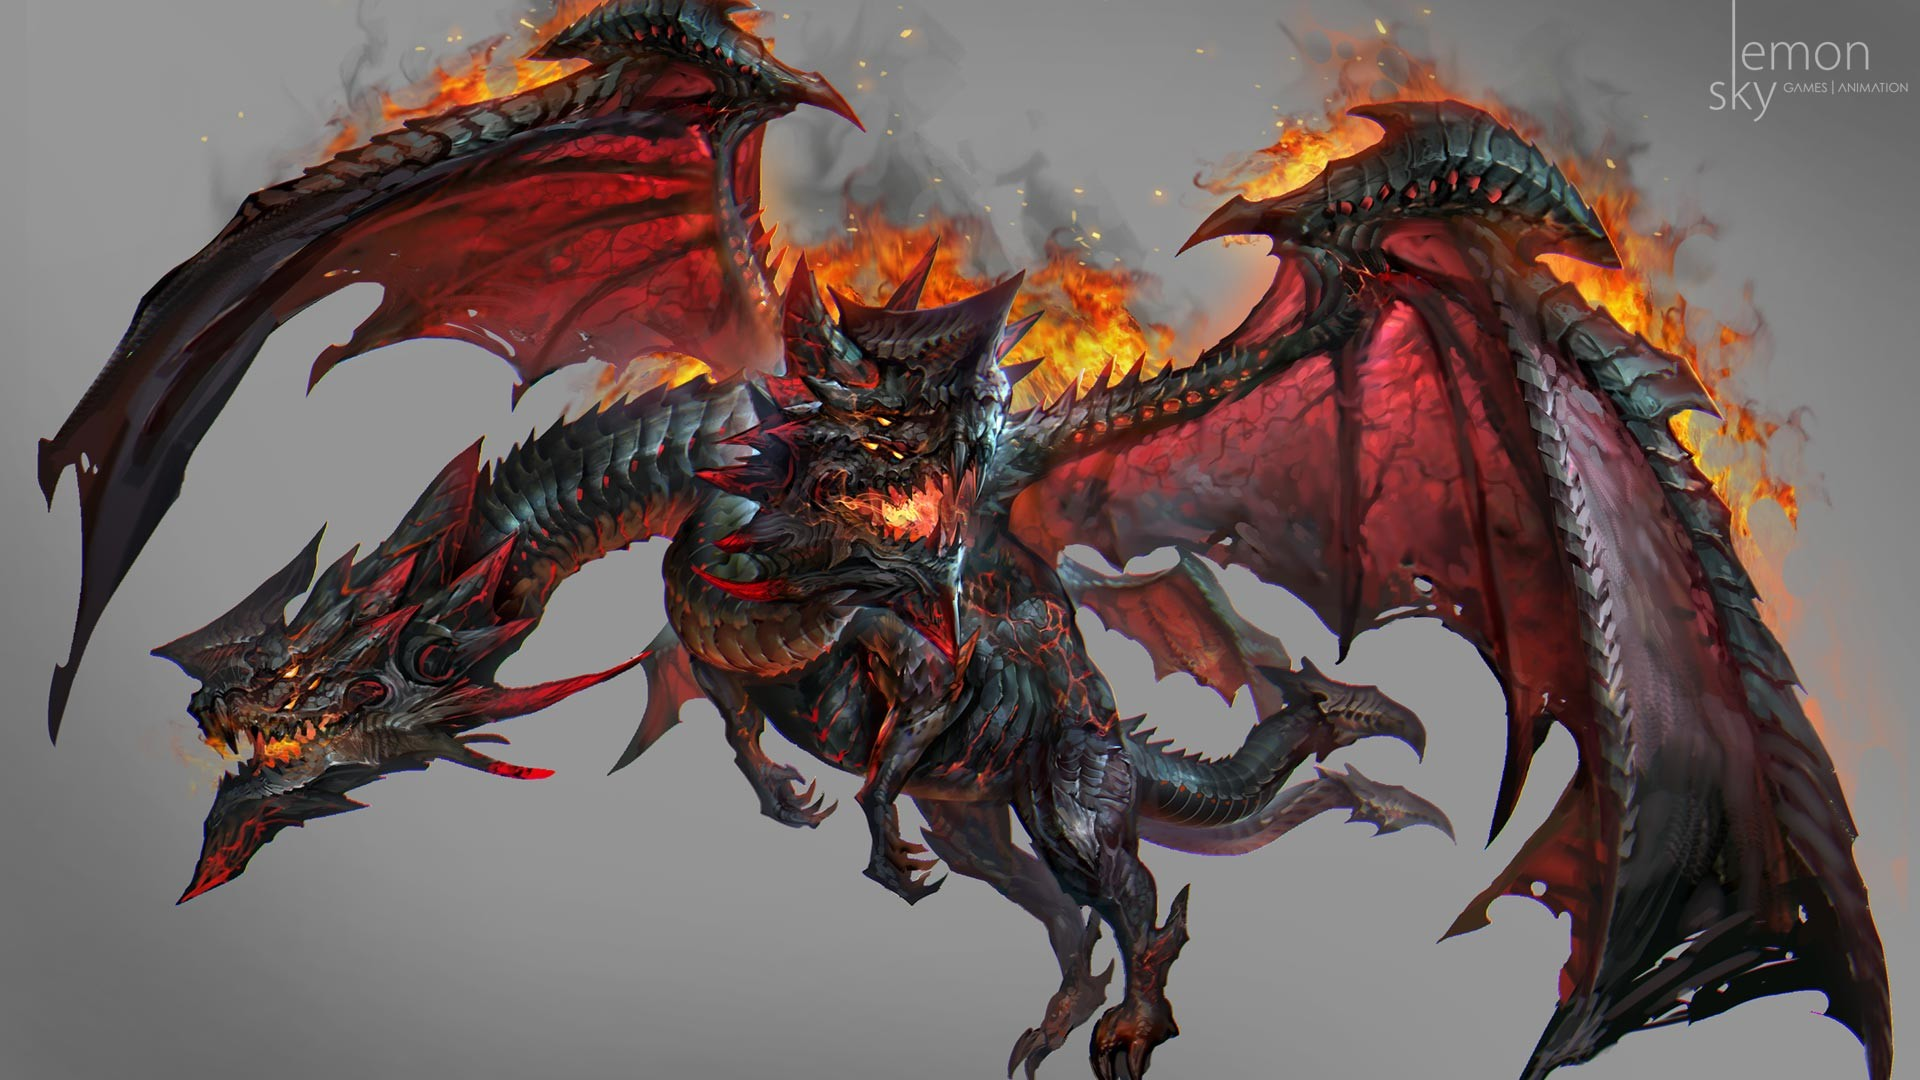 Jeremy chong lemonsky ateam cardgame conceptart dragon02 b